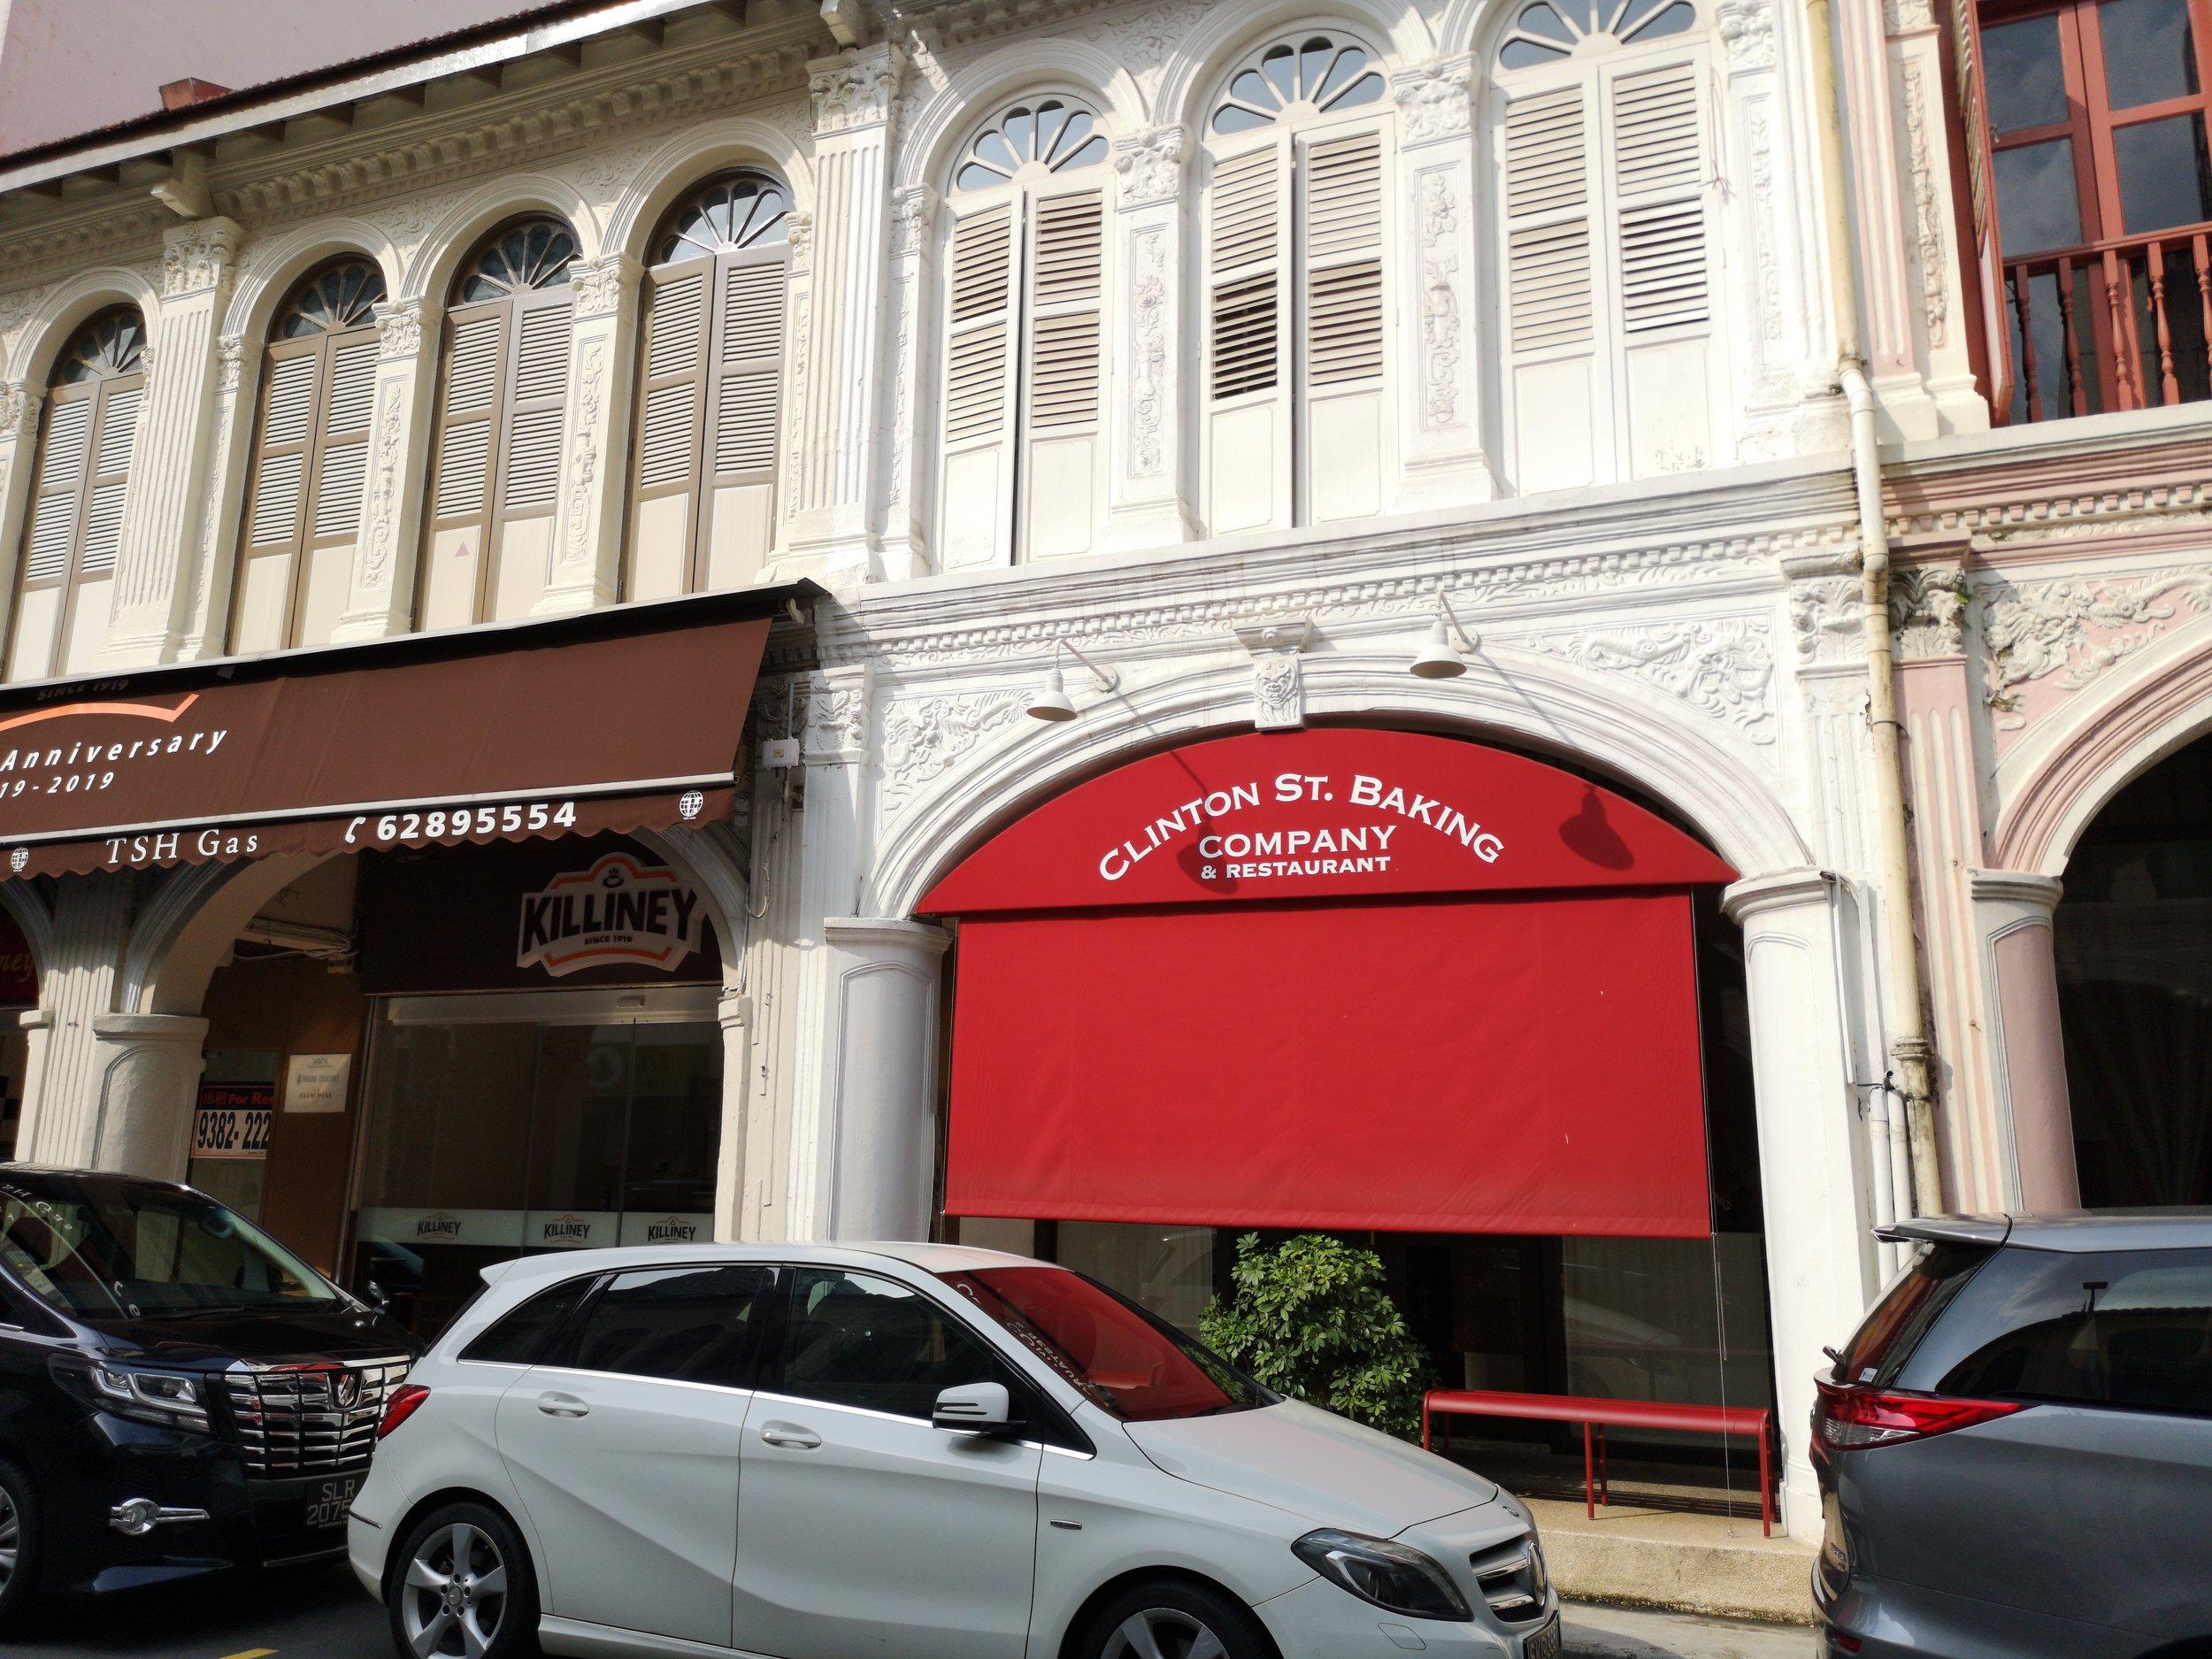 Clinton Street Baking Co Purvis Street Singapore